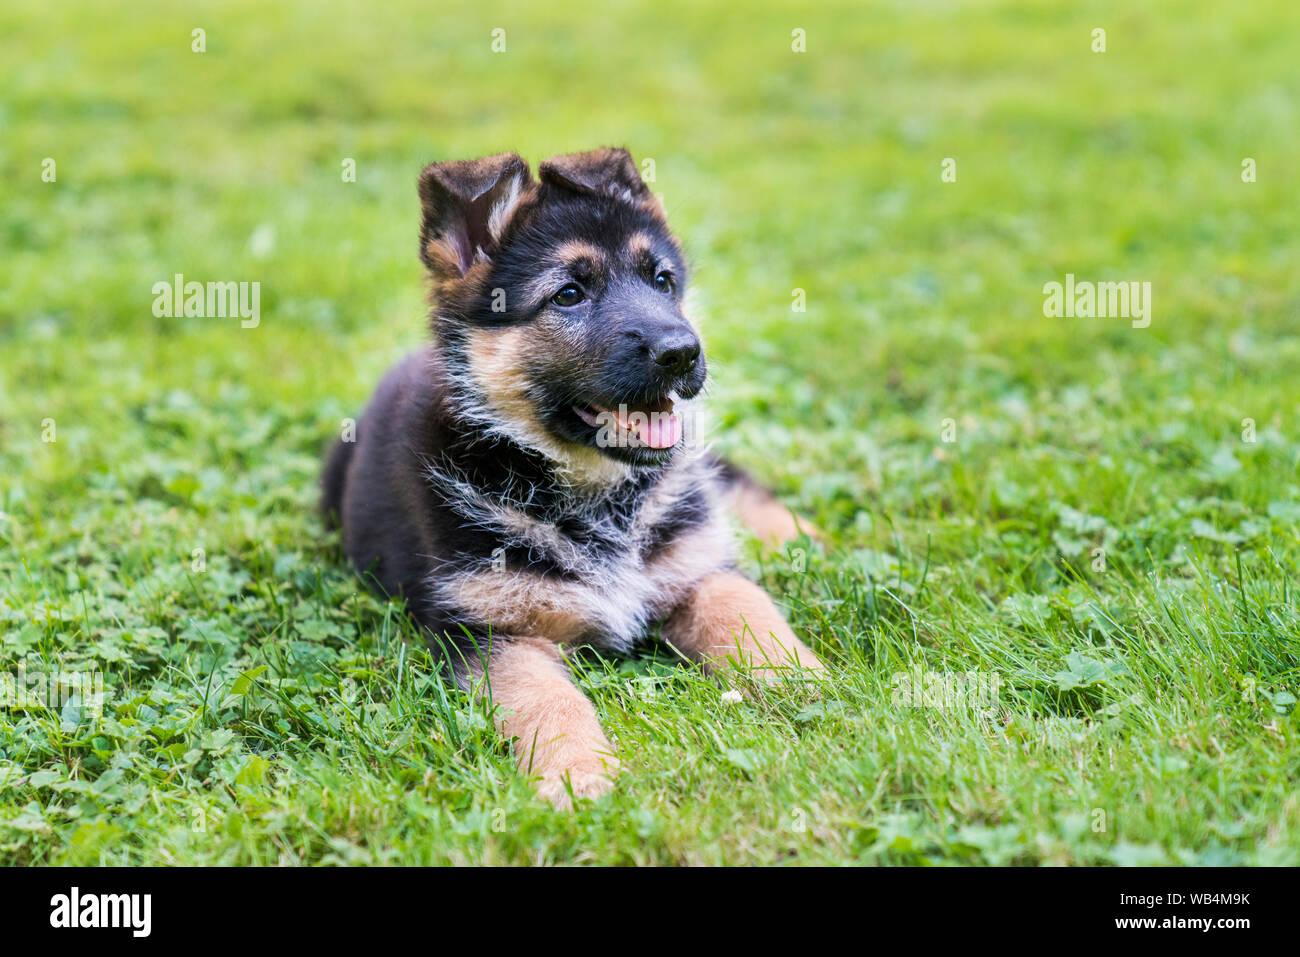 German Shepherd Puppy Enjoying Sitting In The Grass On A Sunny Day Stock Photo Alamy